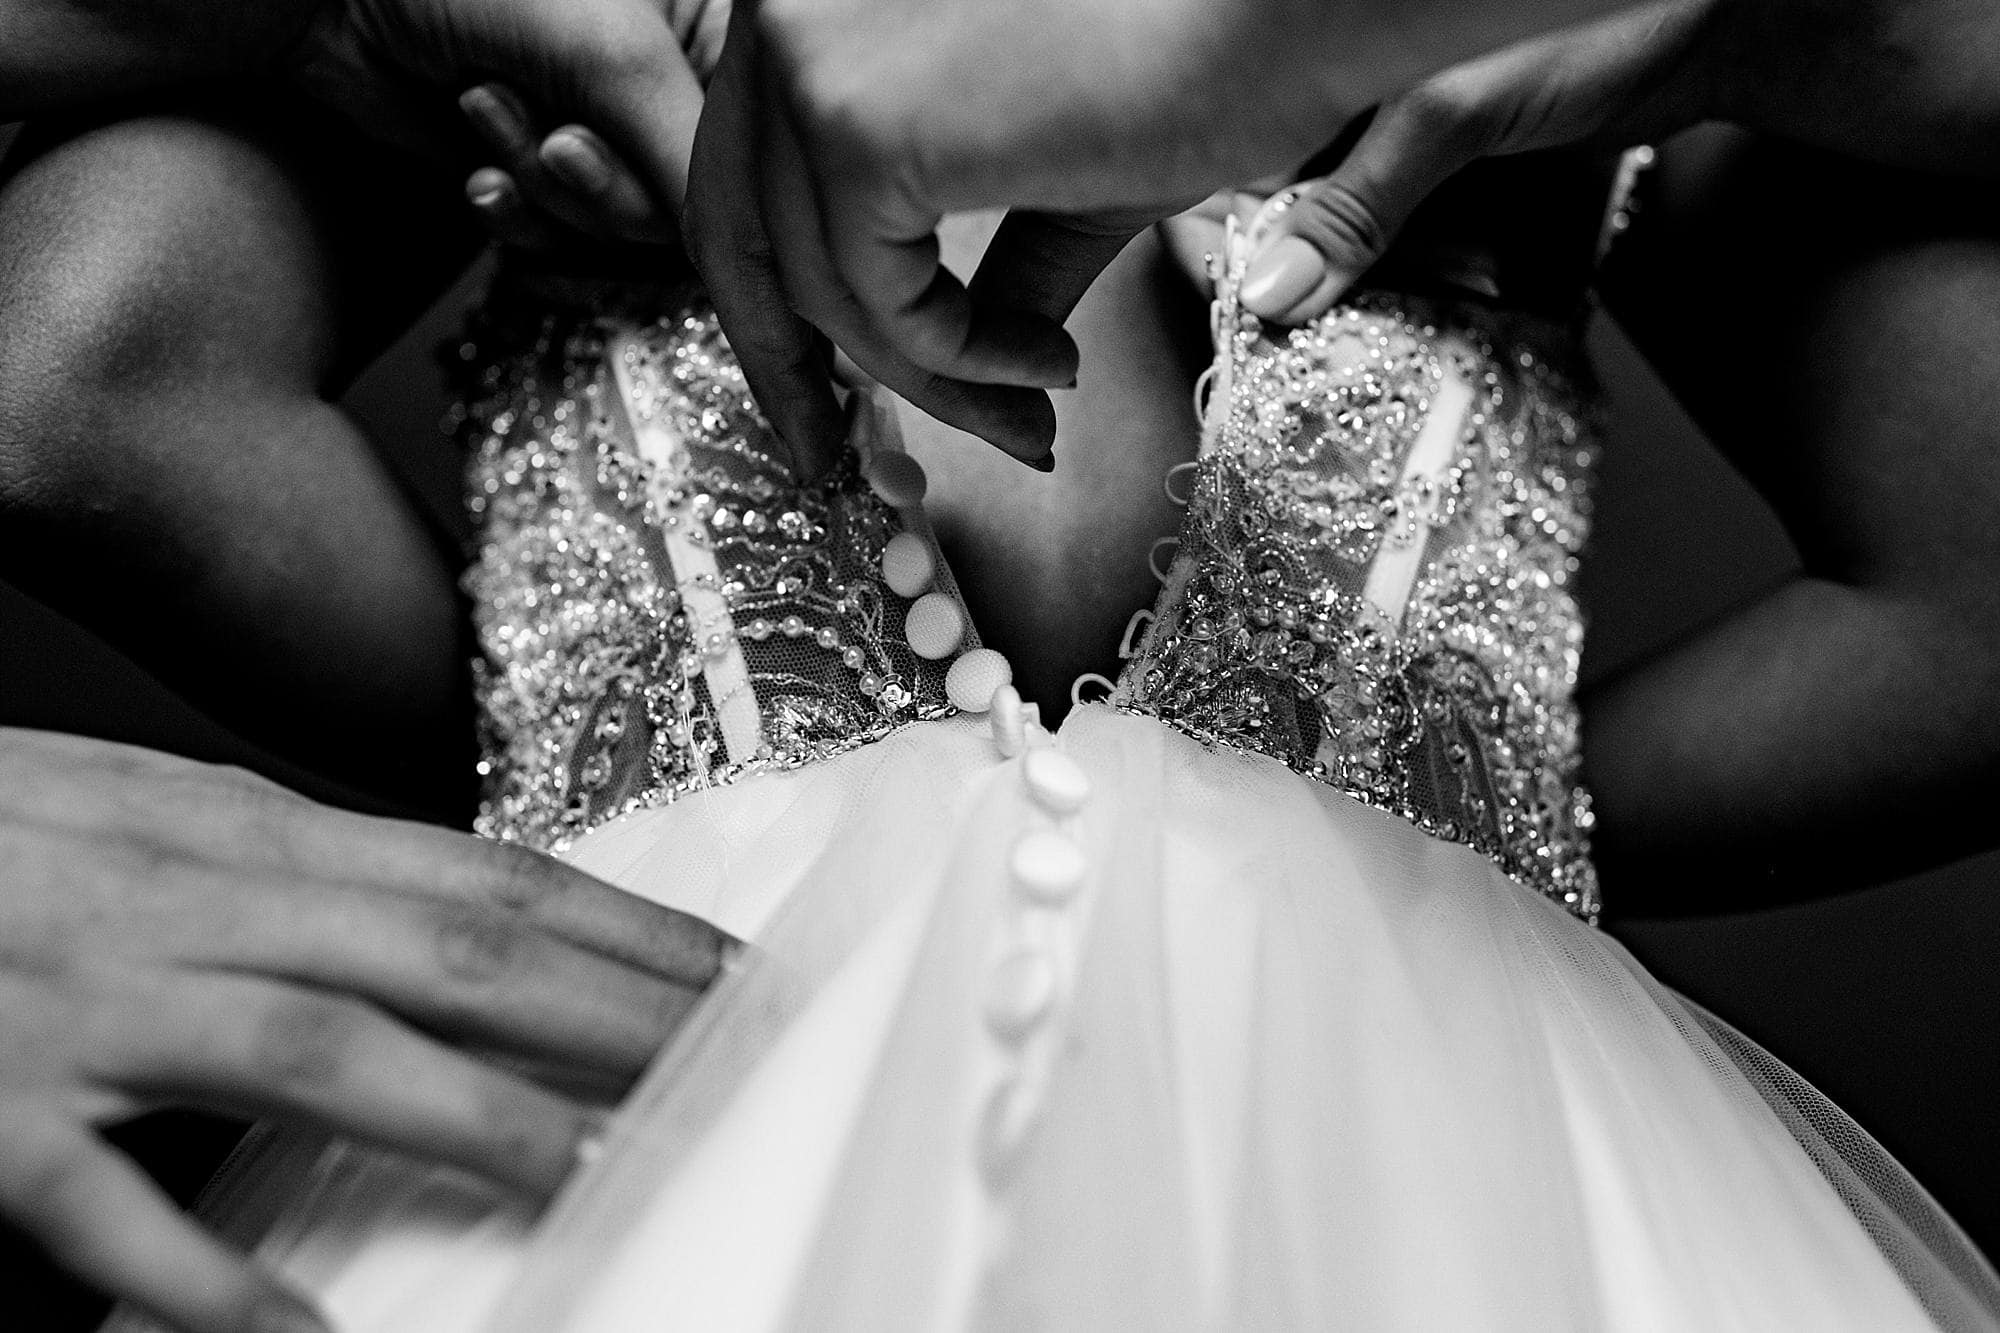 bridesmaids buttoning bride's dress